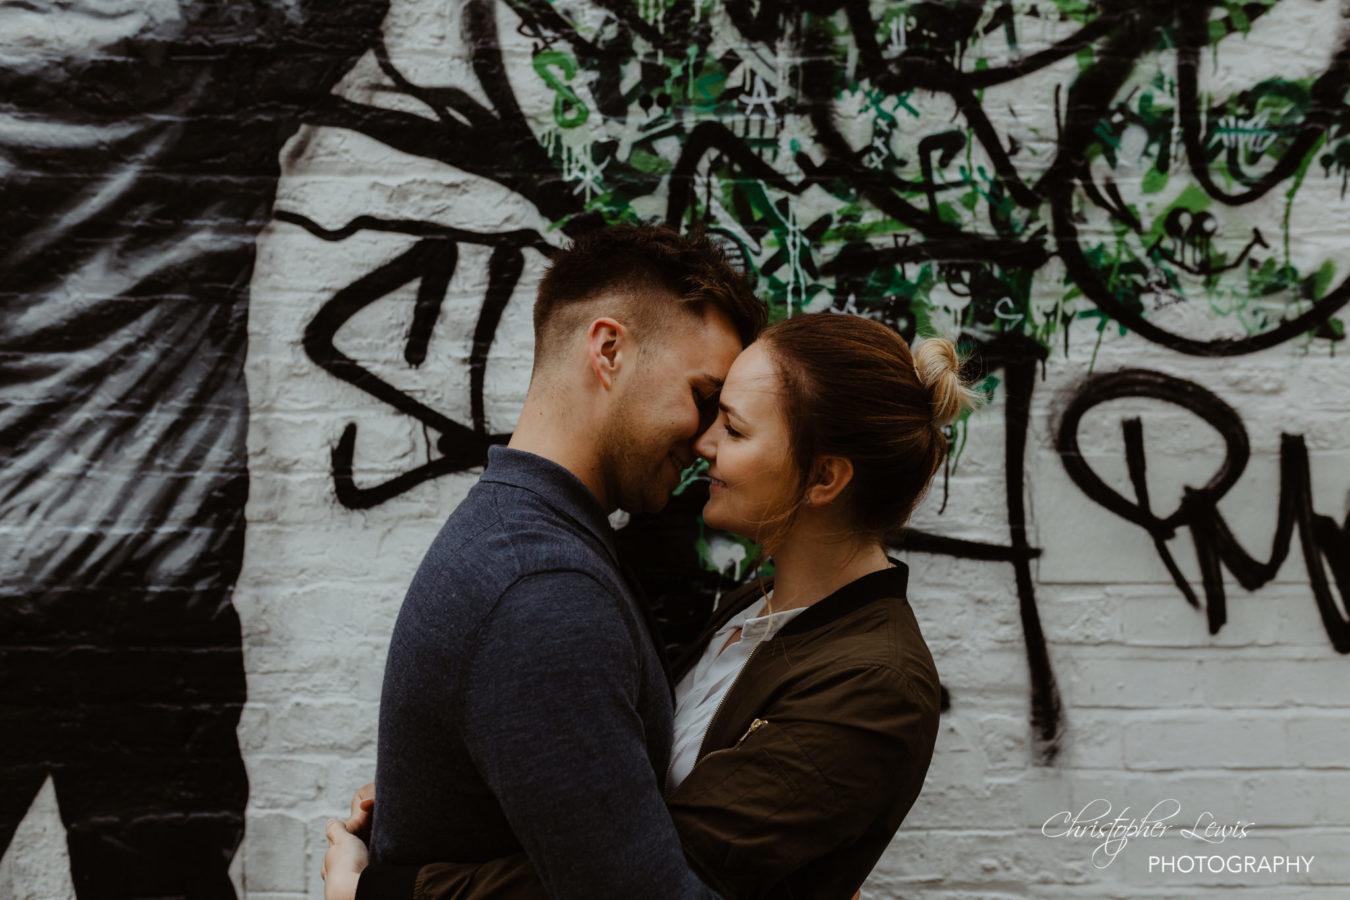 Northern-Quarter-Manchester-Pre-Wedding-Photoshoot-30